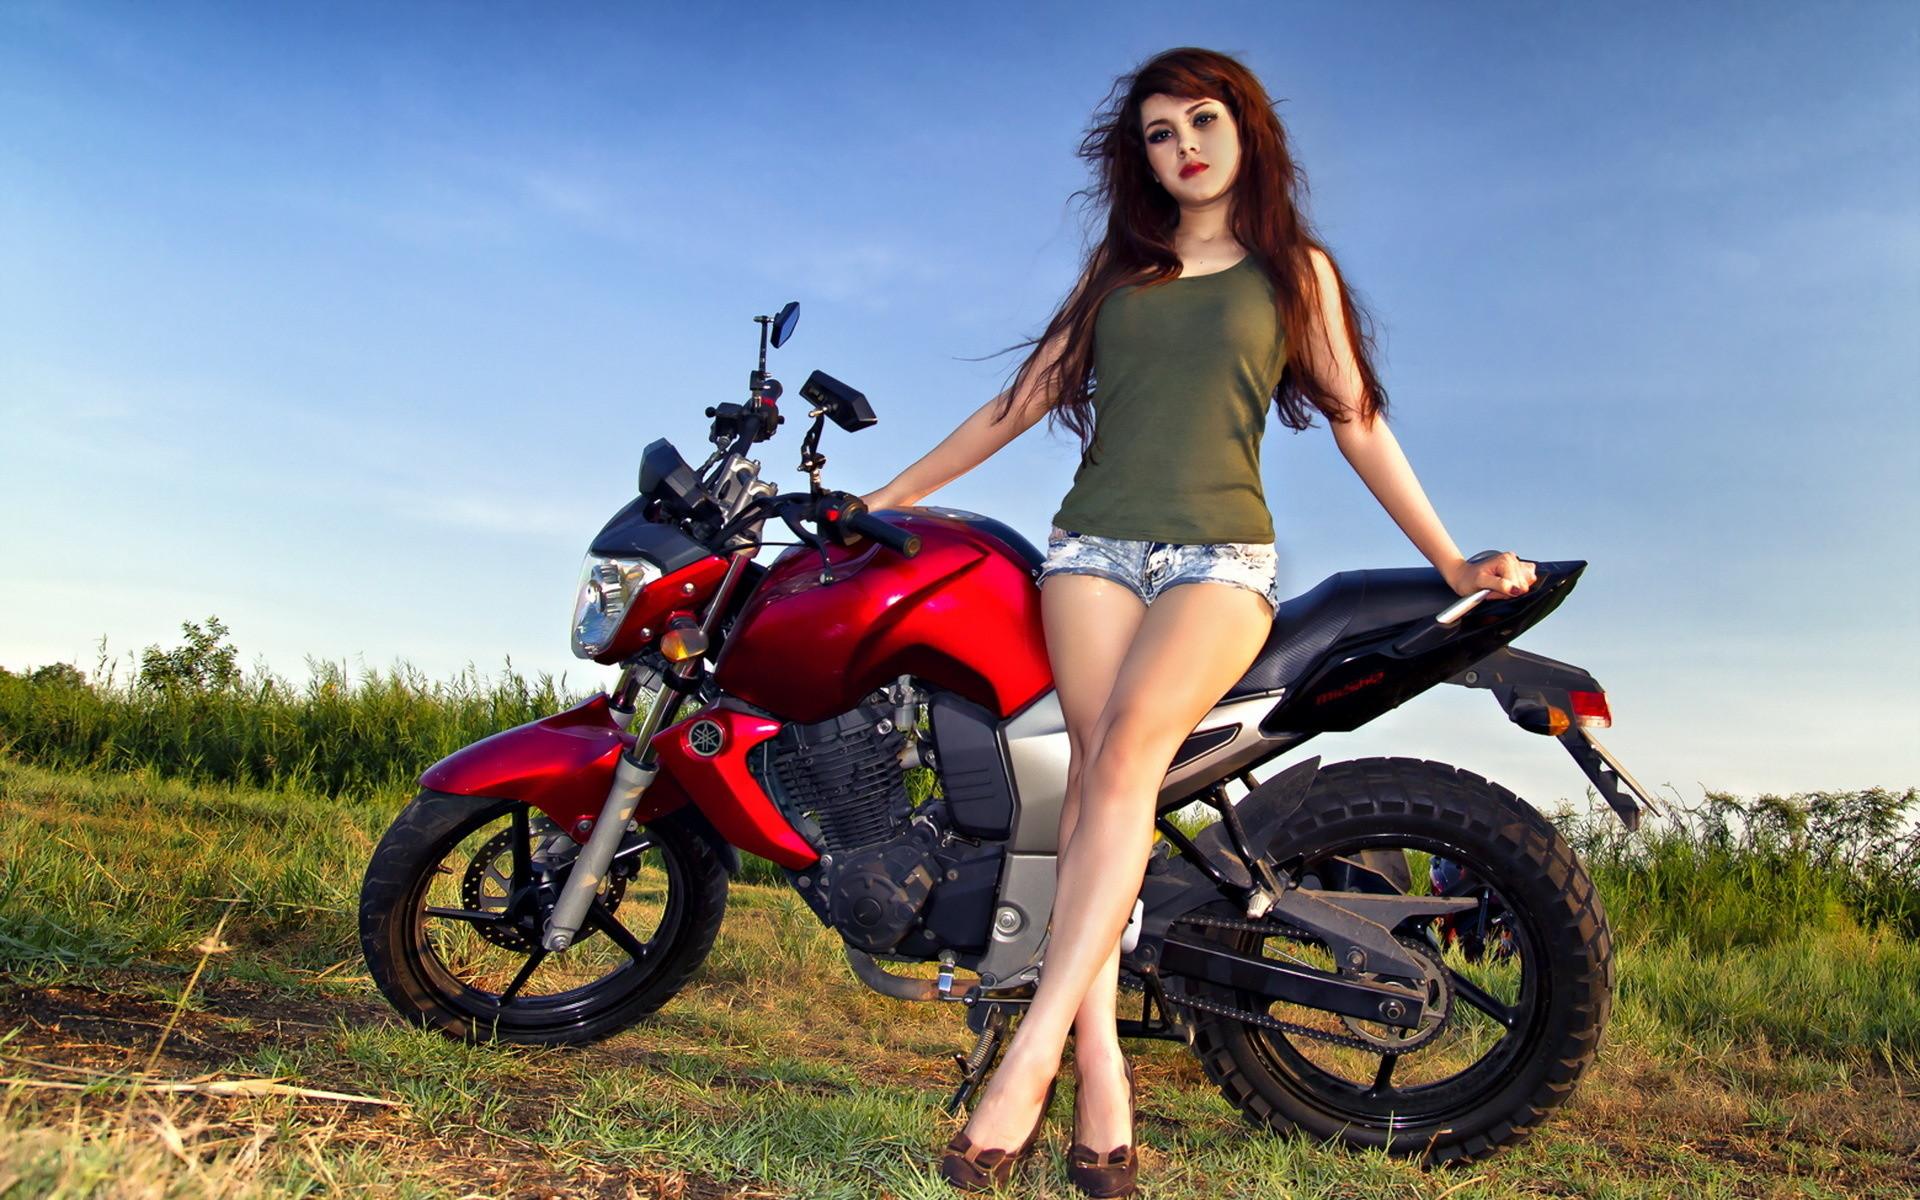 Motorcycle shorts legs asian wallpaper | | 217058 | WallpaperUP